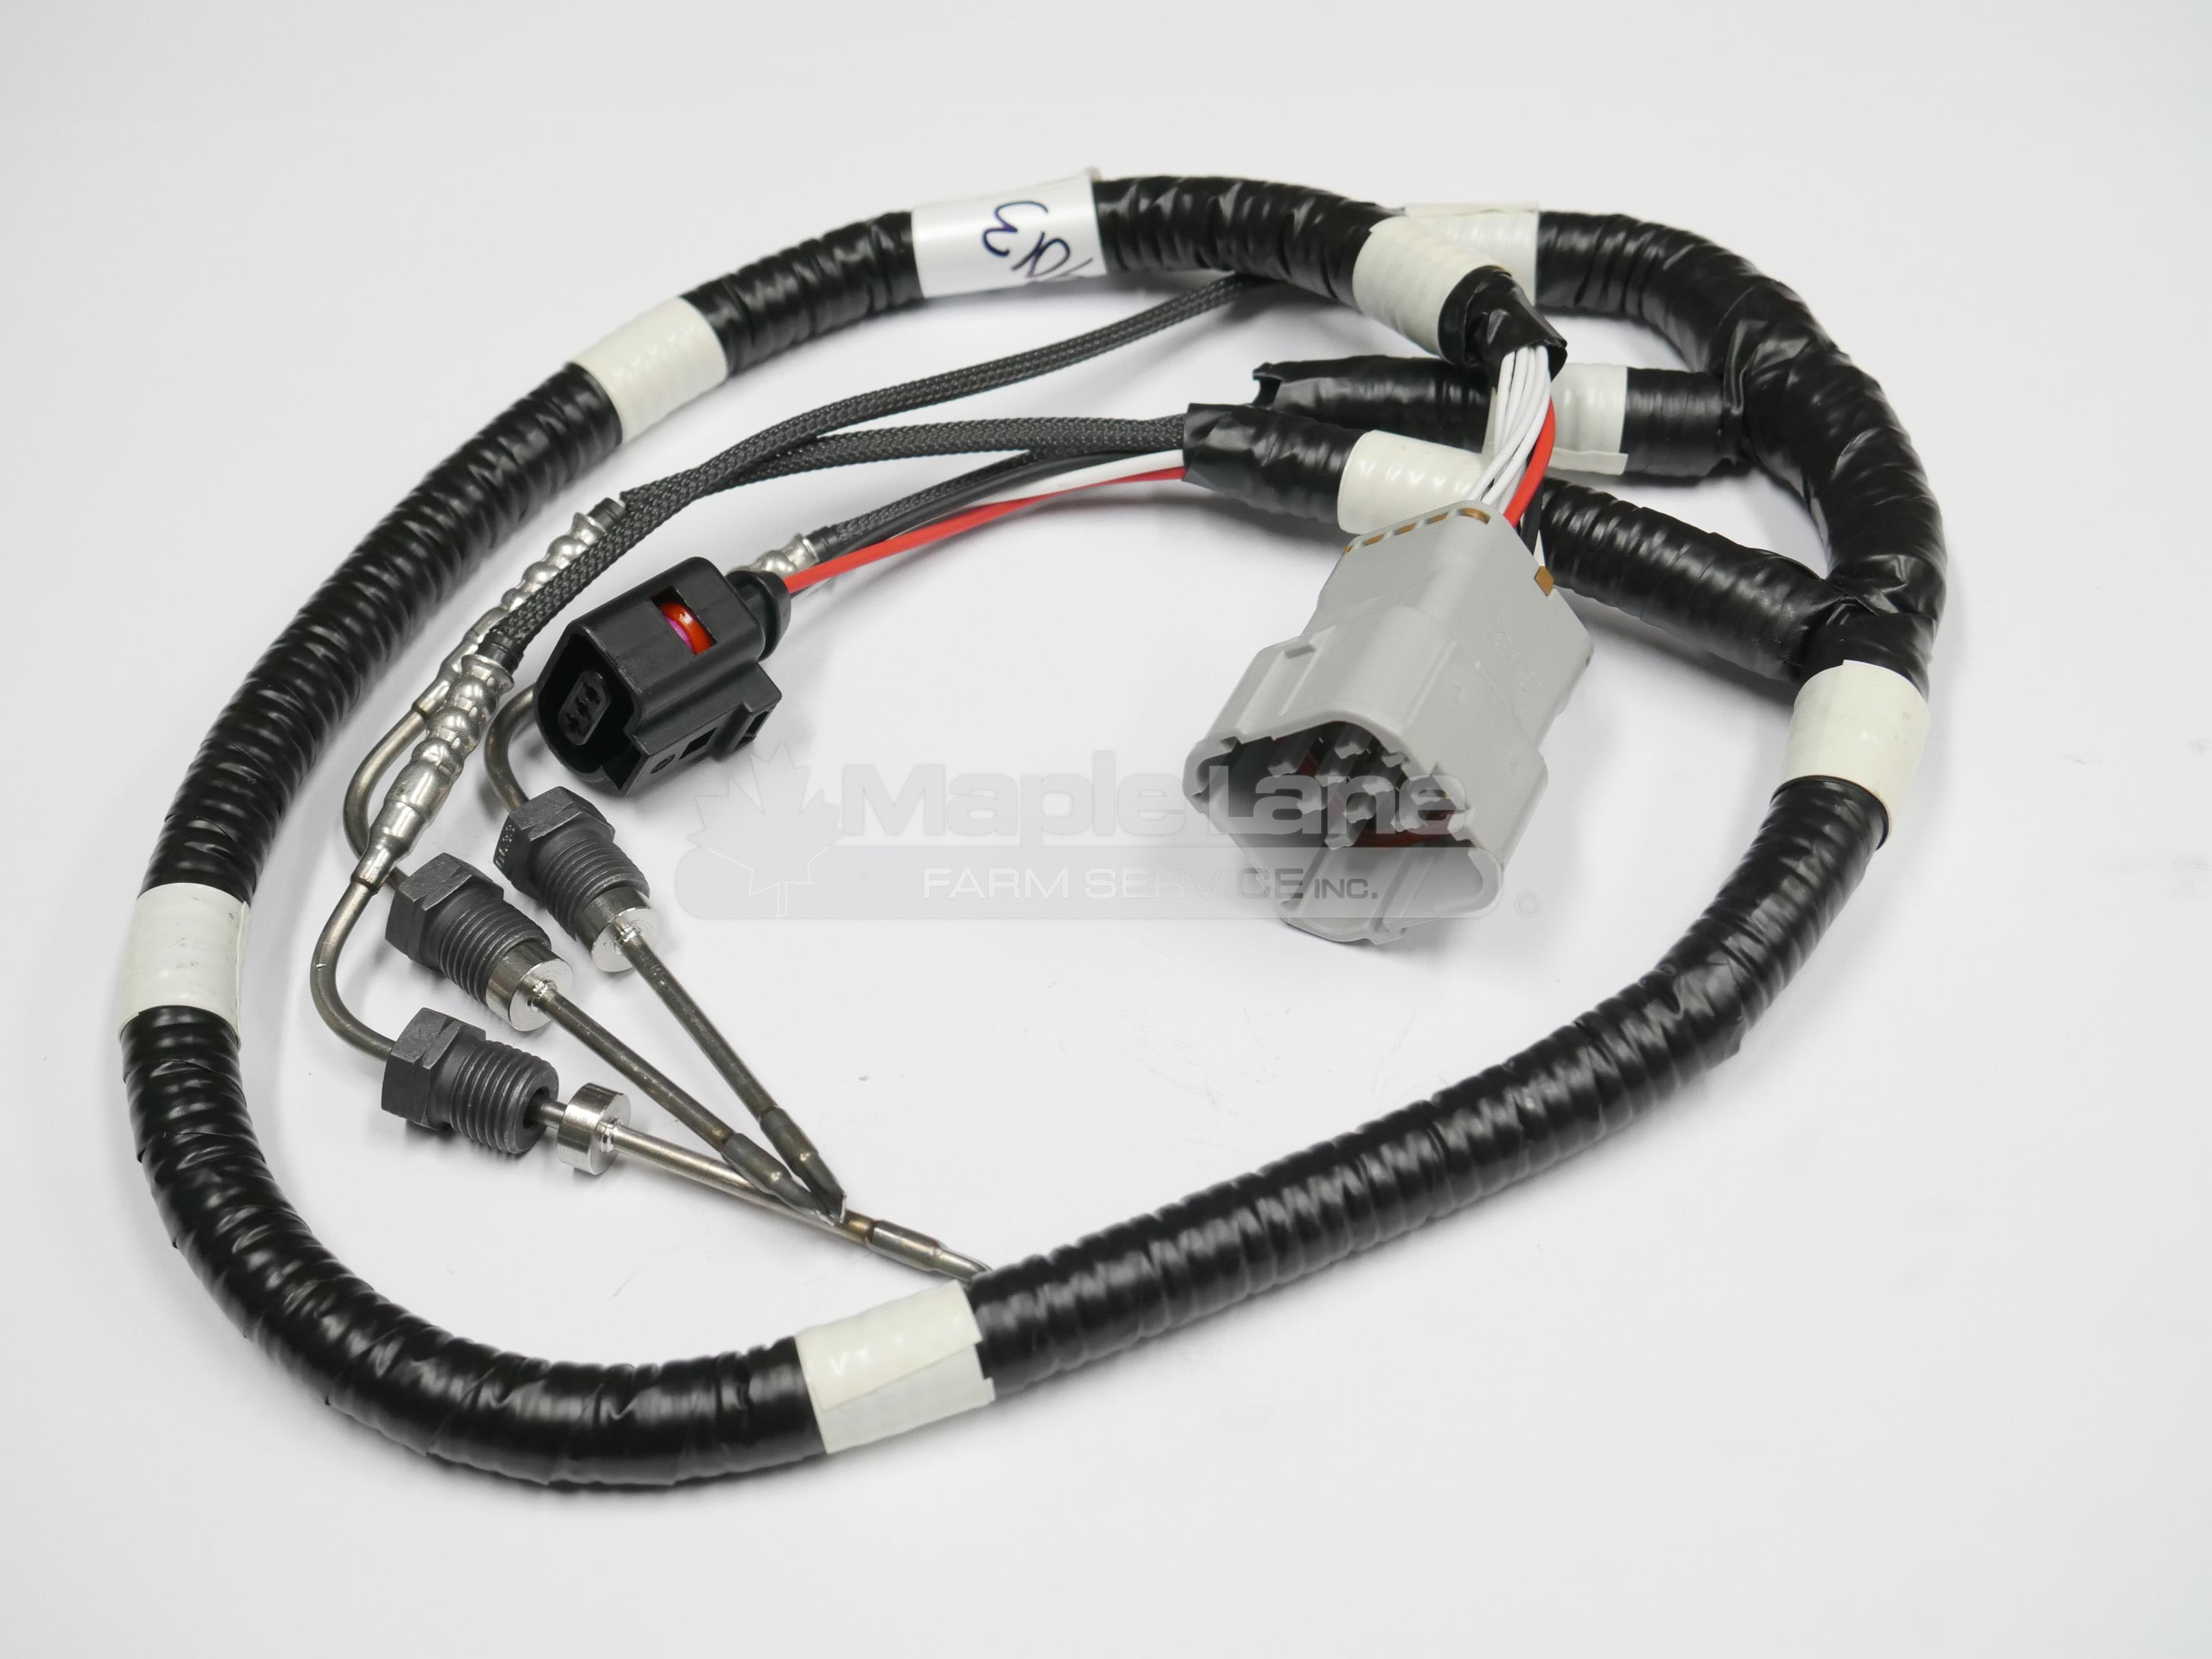 7064066M1 Sensor and Harness